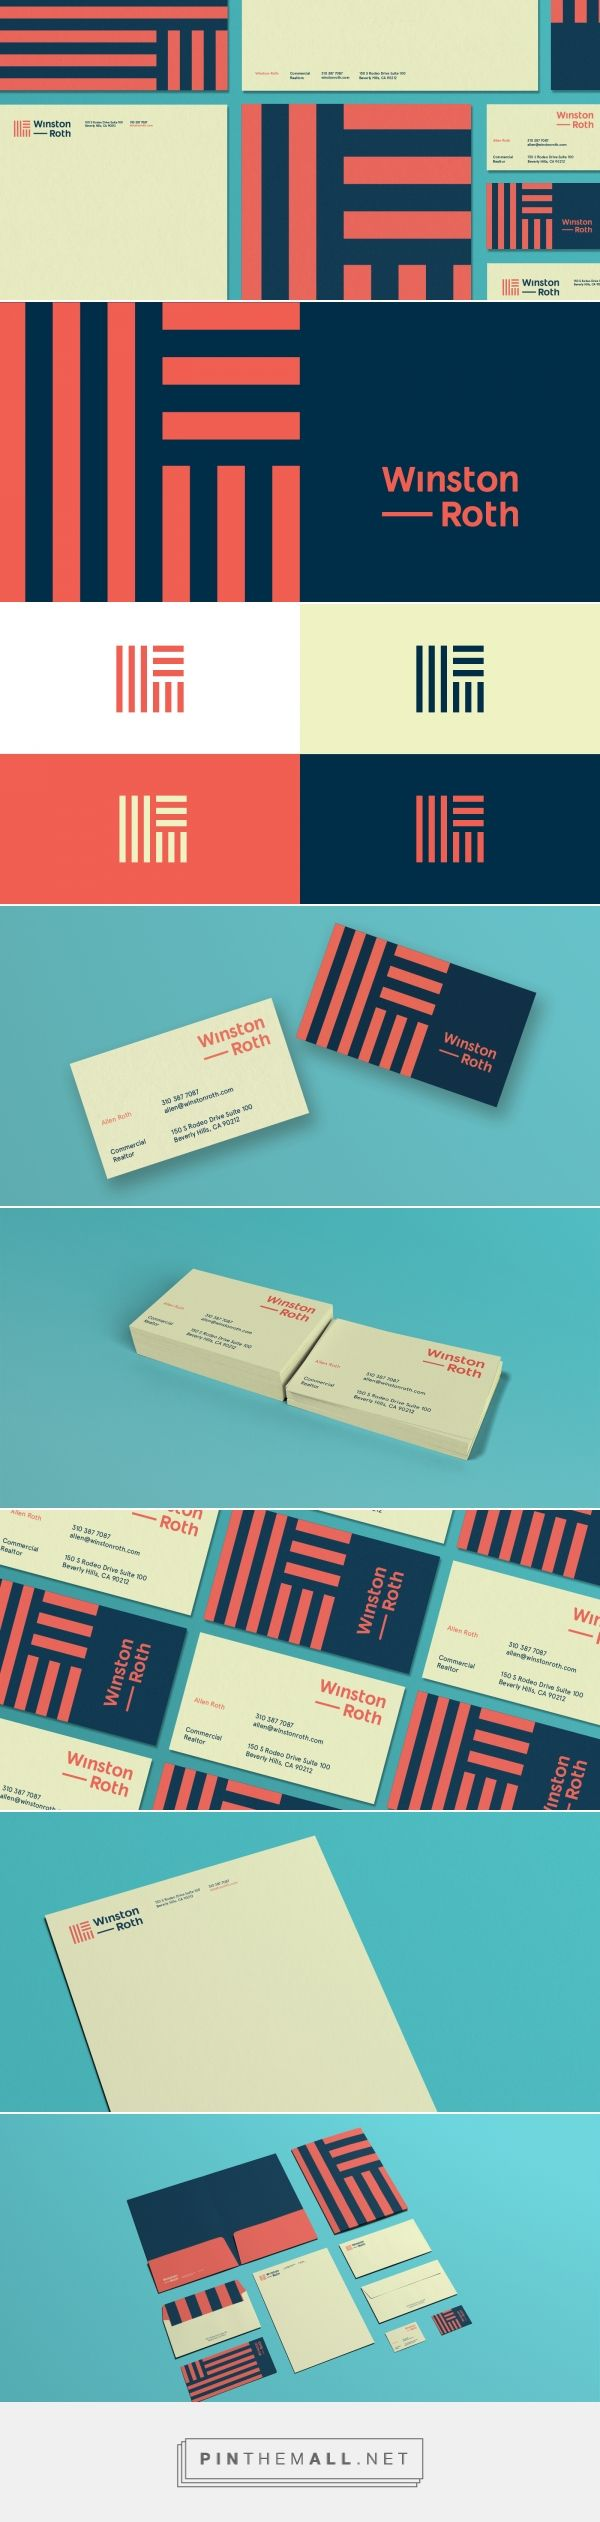 Winston-Roth Branding by Mast | Fivestar Branding – Design and Branding Agency & Inspiration Gallery